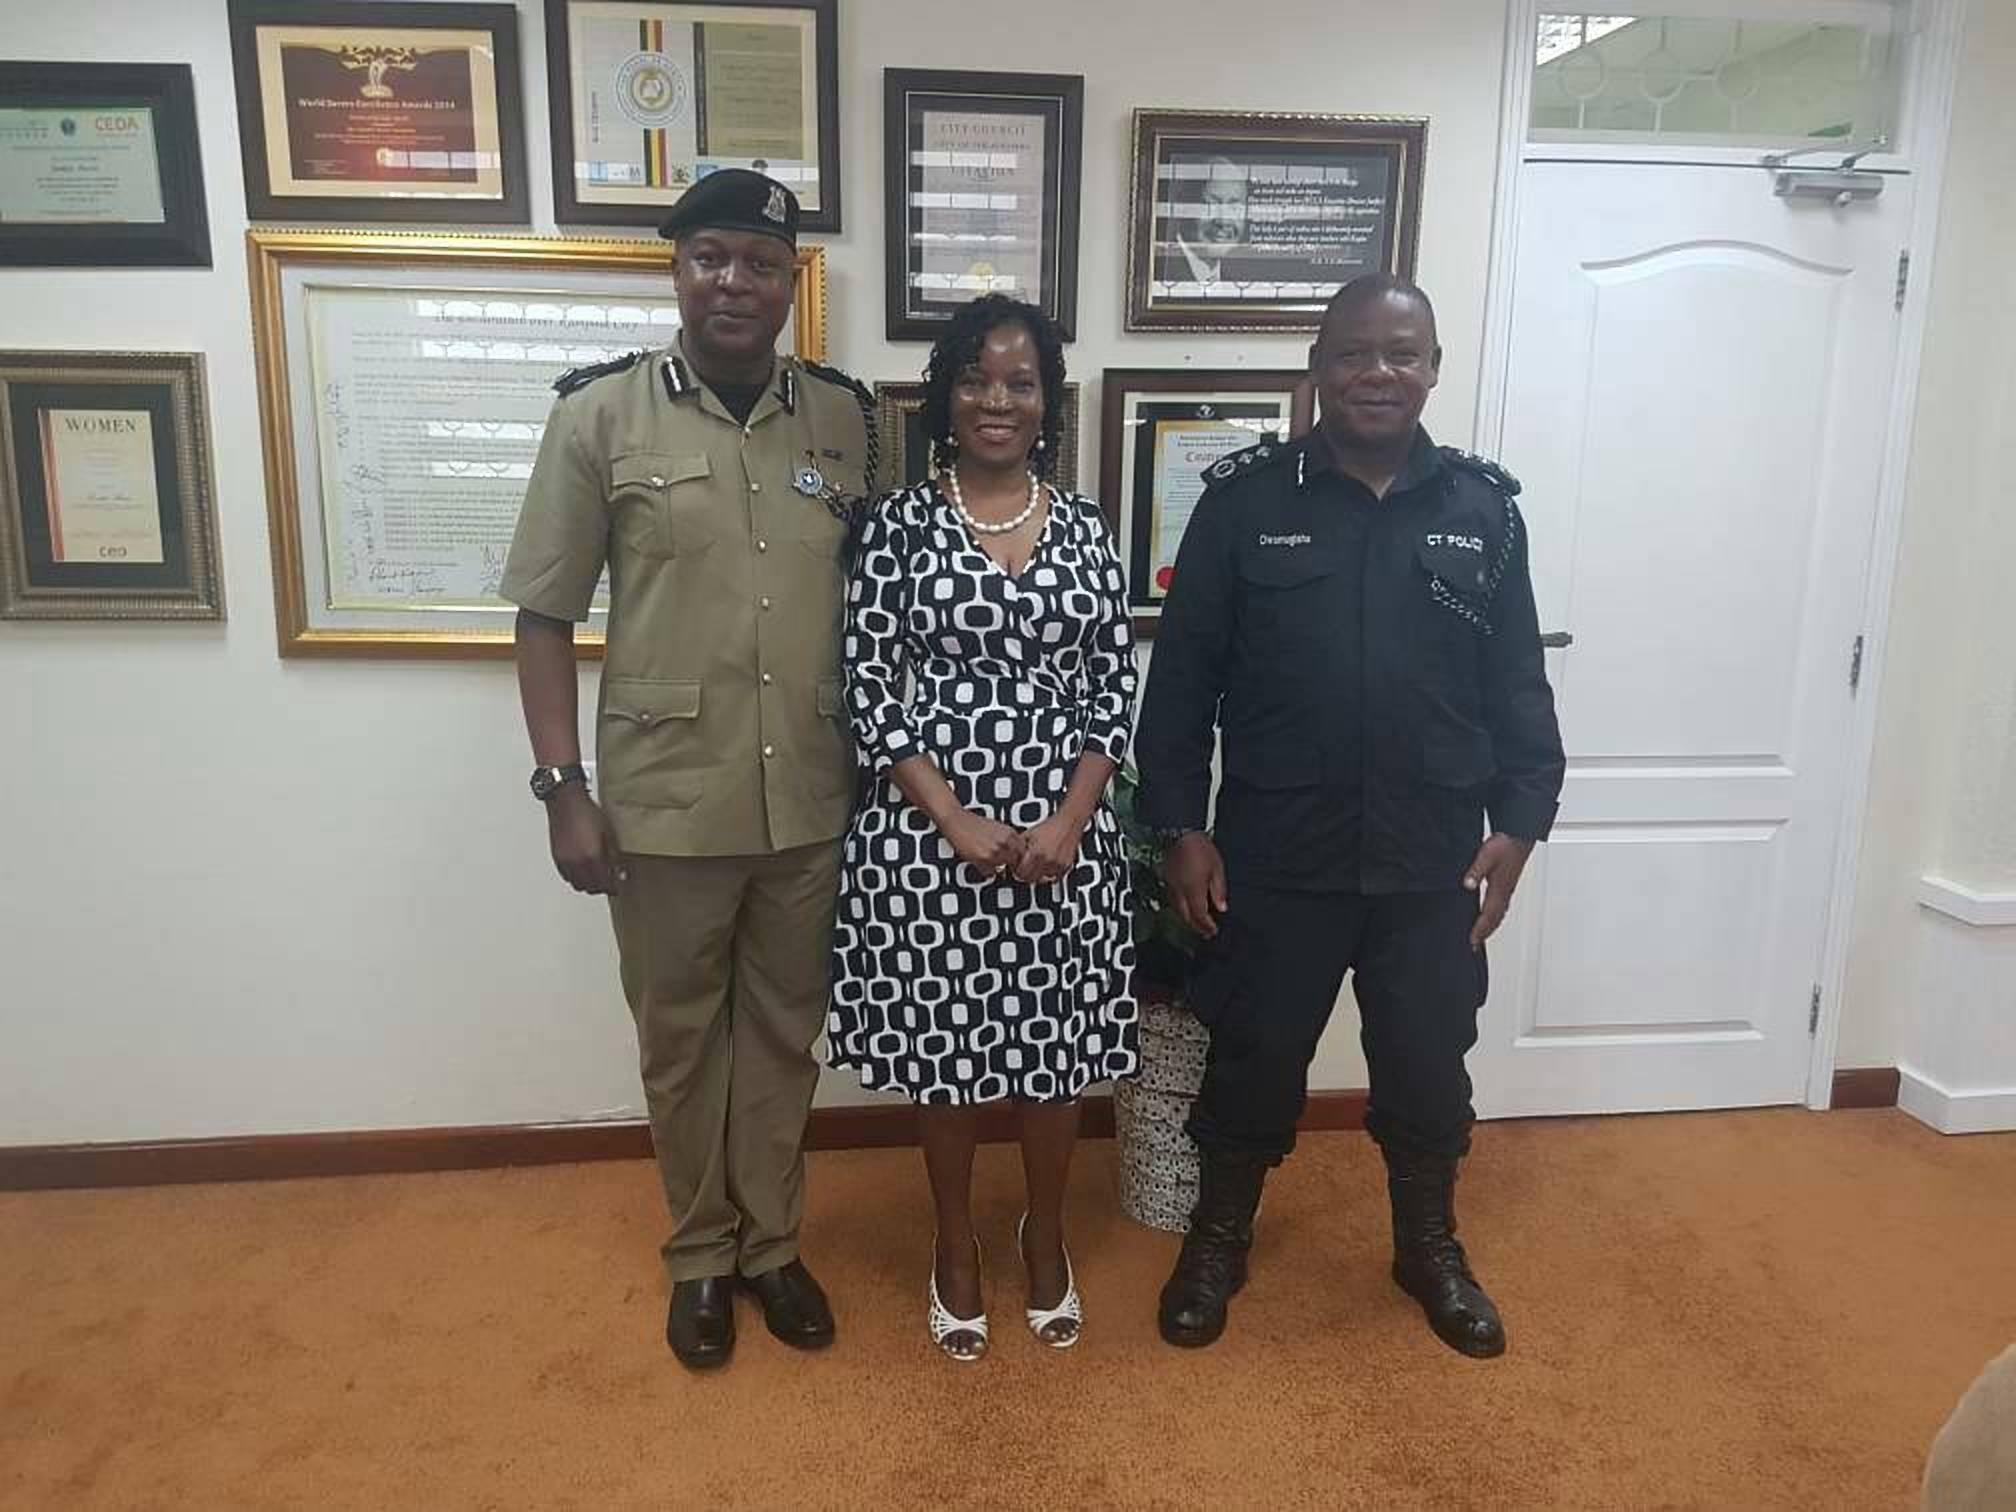 Kampala Metropolitan Police (KMP) Commander, Moses Kafeero Kabugo, and KCCA Executive Director Jennifer Musisi share a photo following Monday's meeting to discuss strategic security matters of Kampala (PML PHOTO)